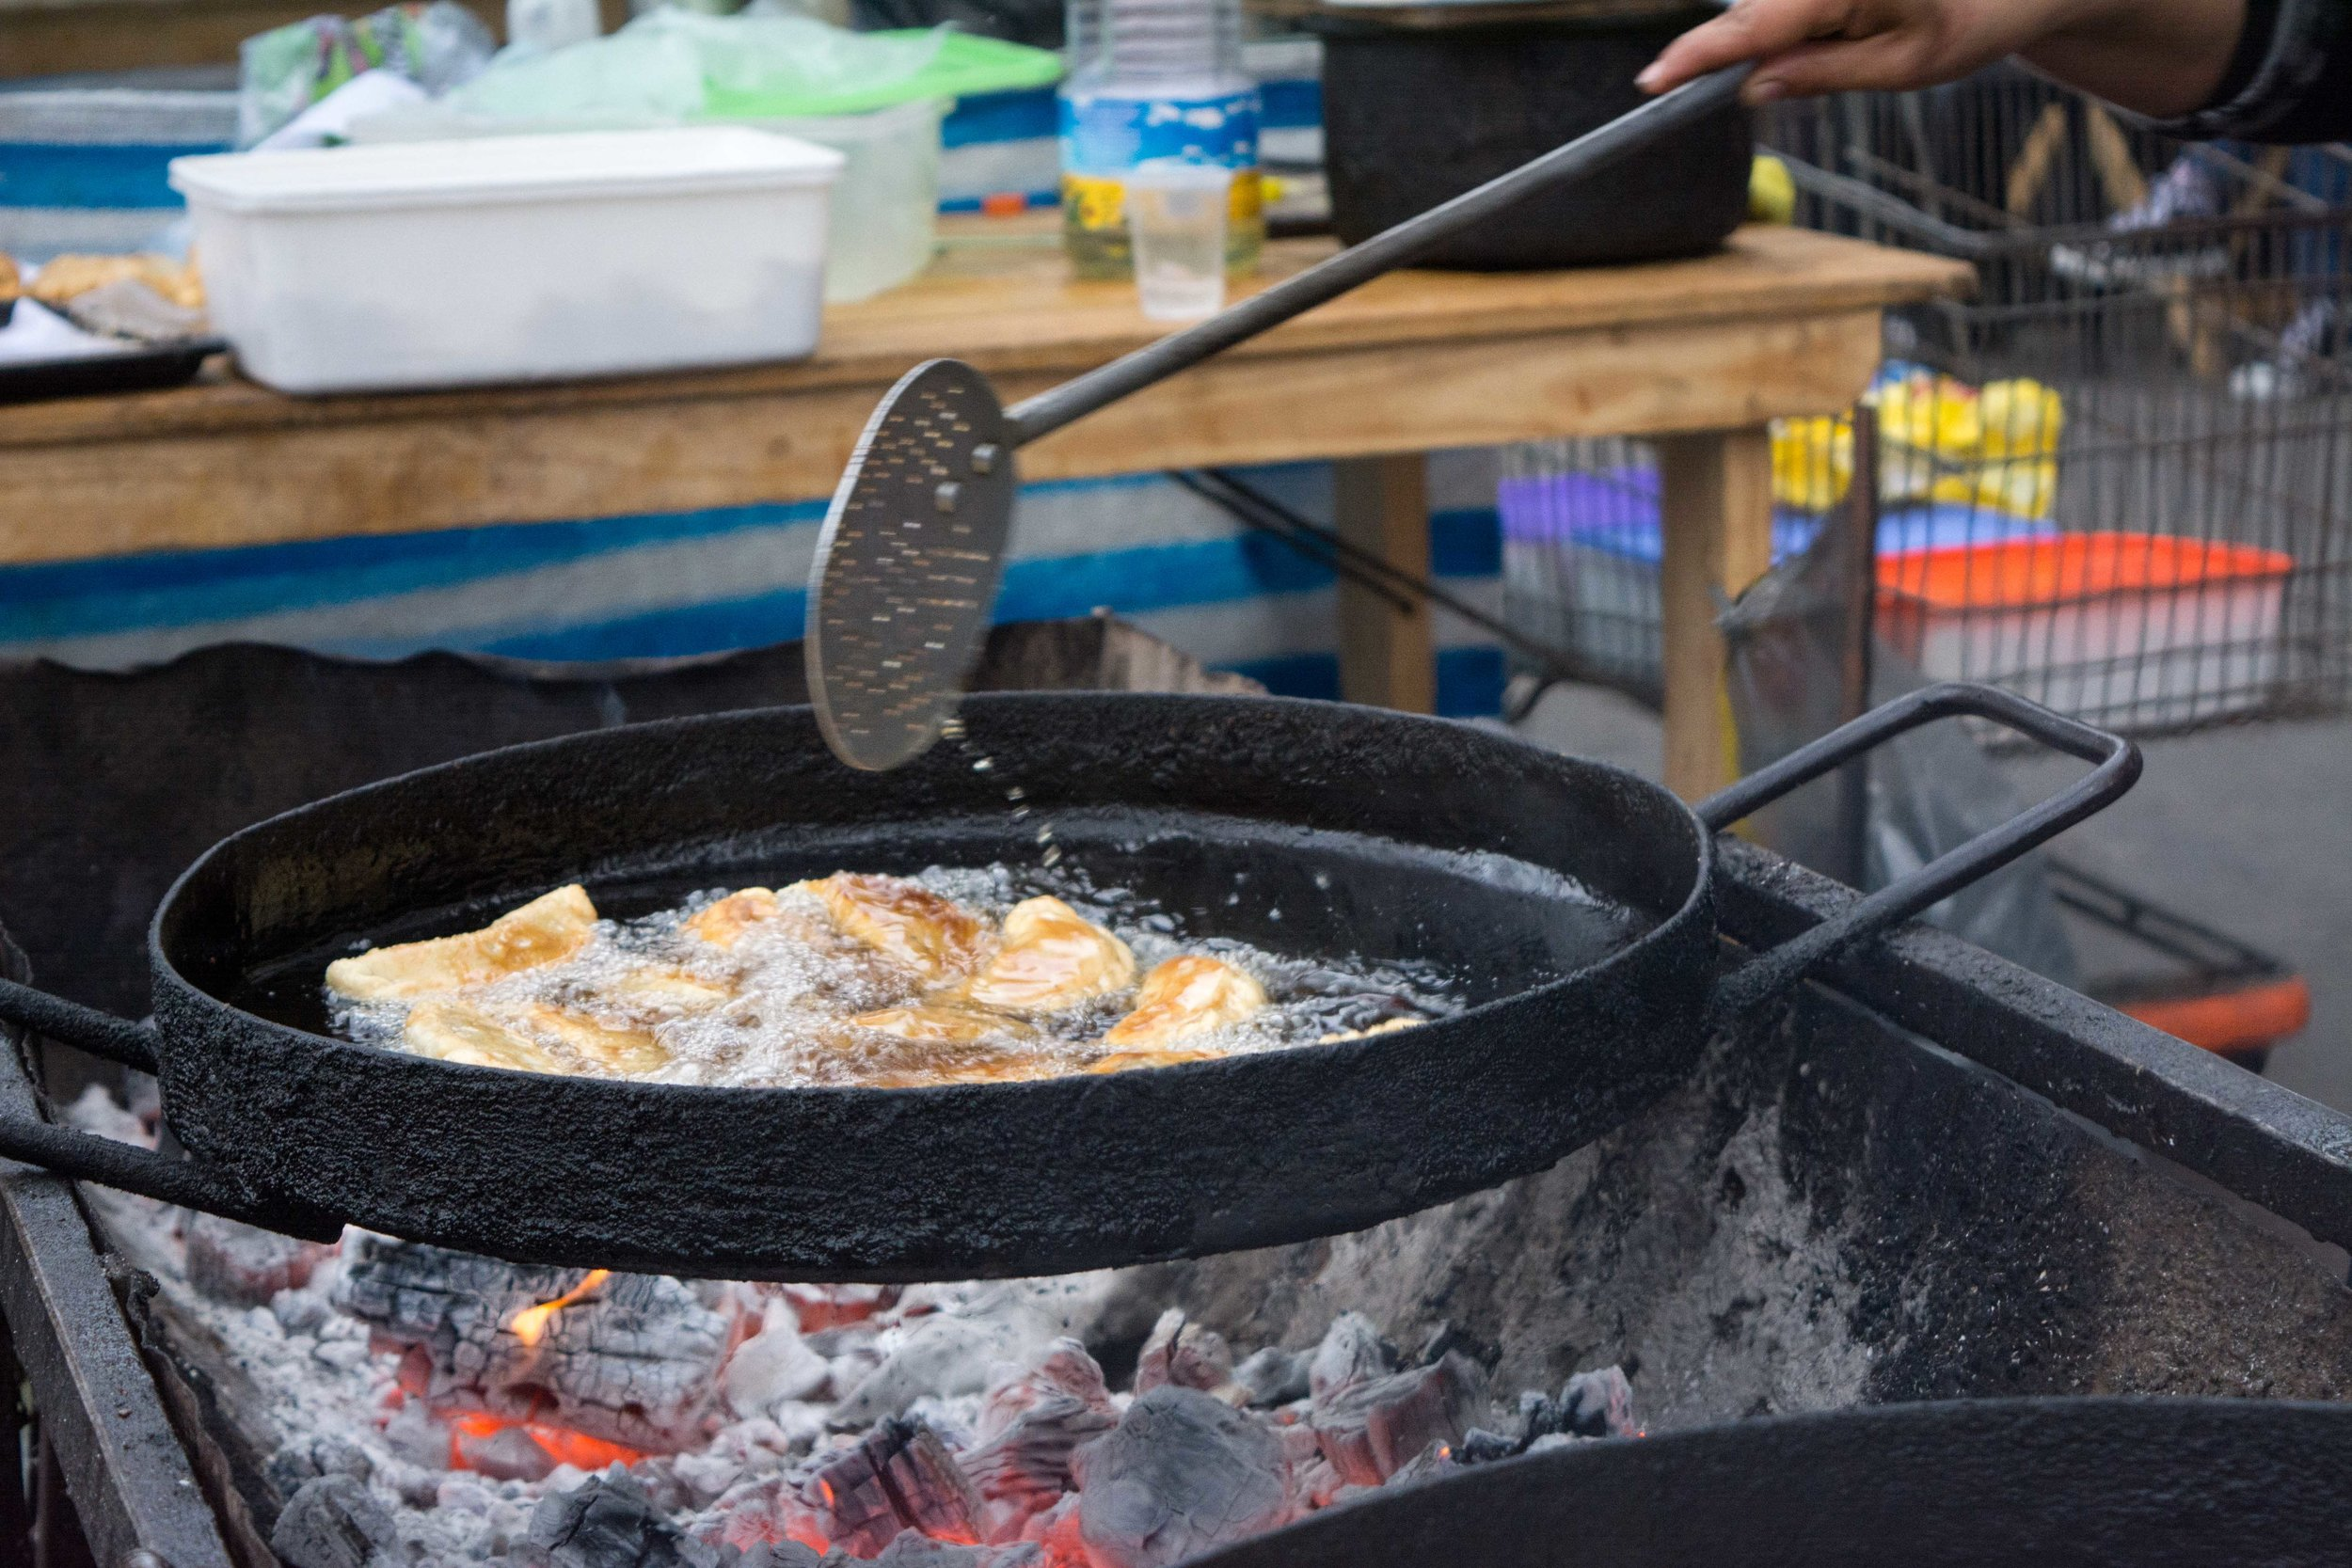 Freshly deep fried empanadas